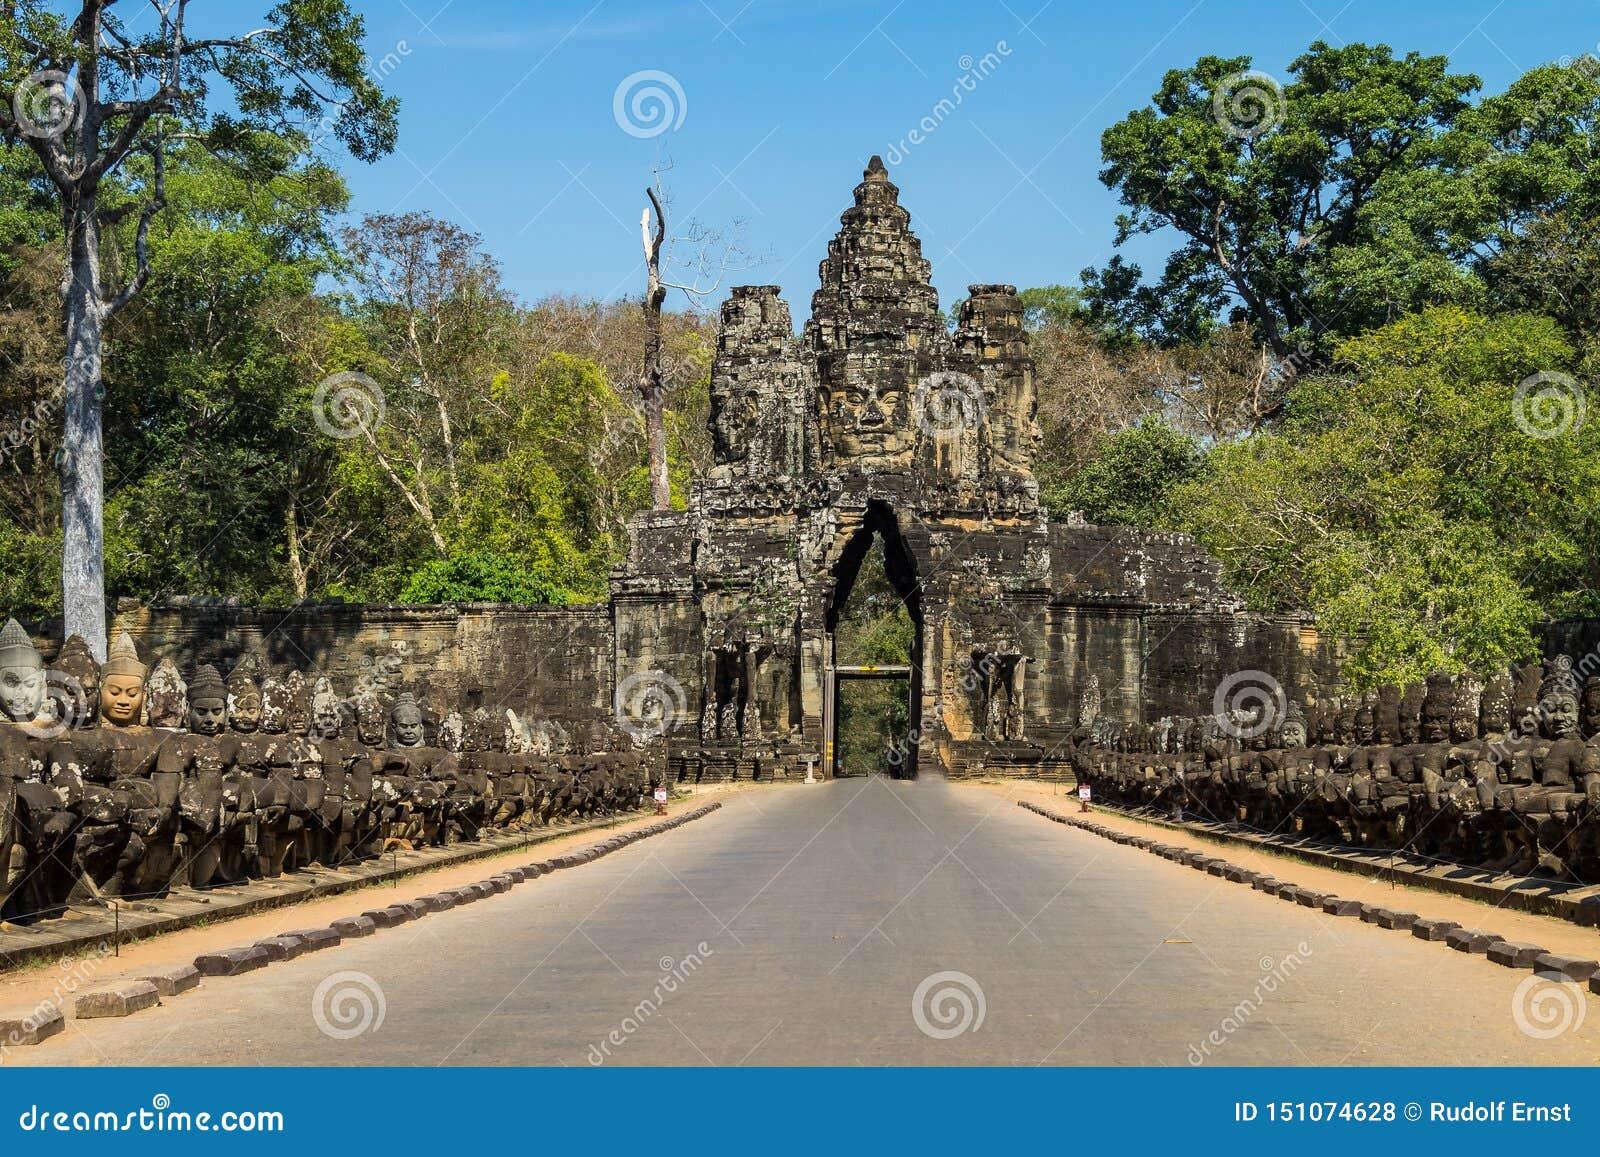 S?dtor nach Angkor Thom in Kambodscha, Asien